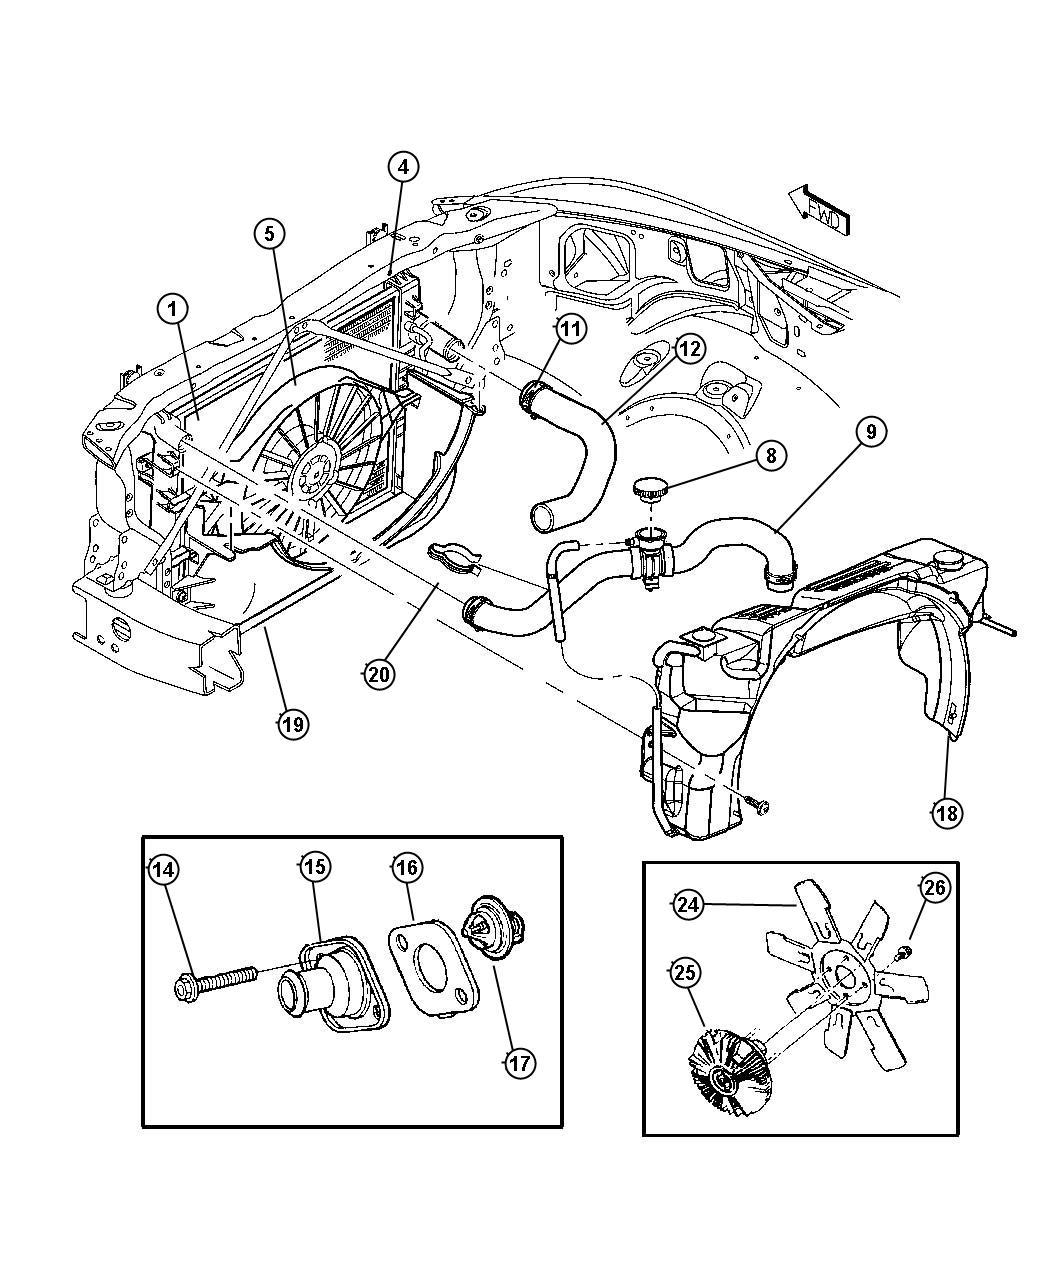 2007 Dodge Caliber Hose. Radiator inlet. Related